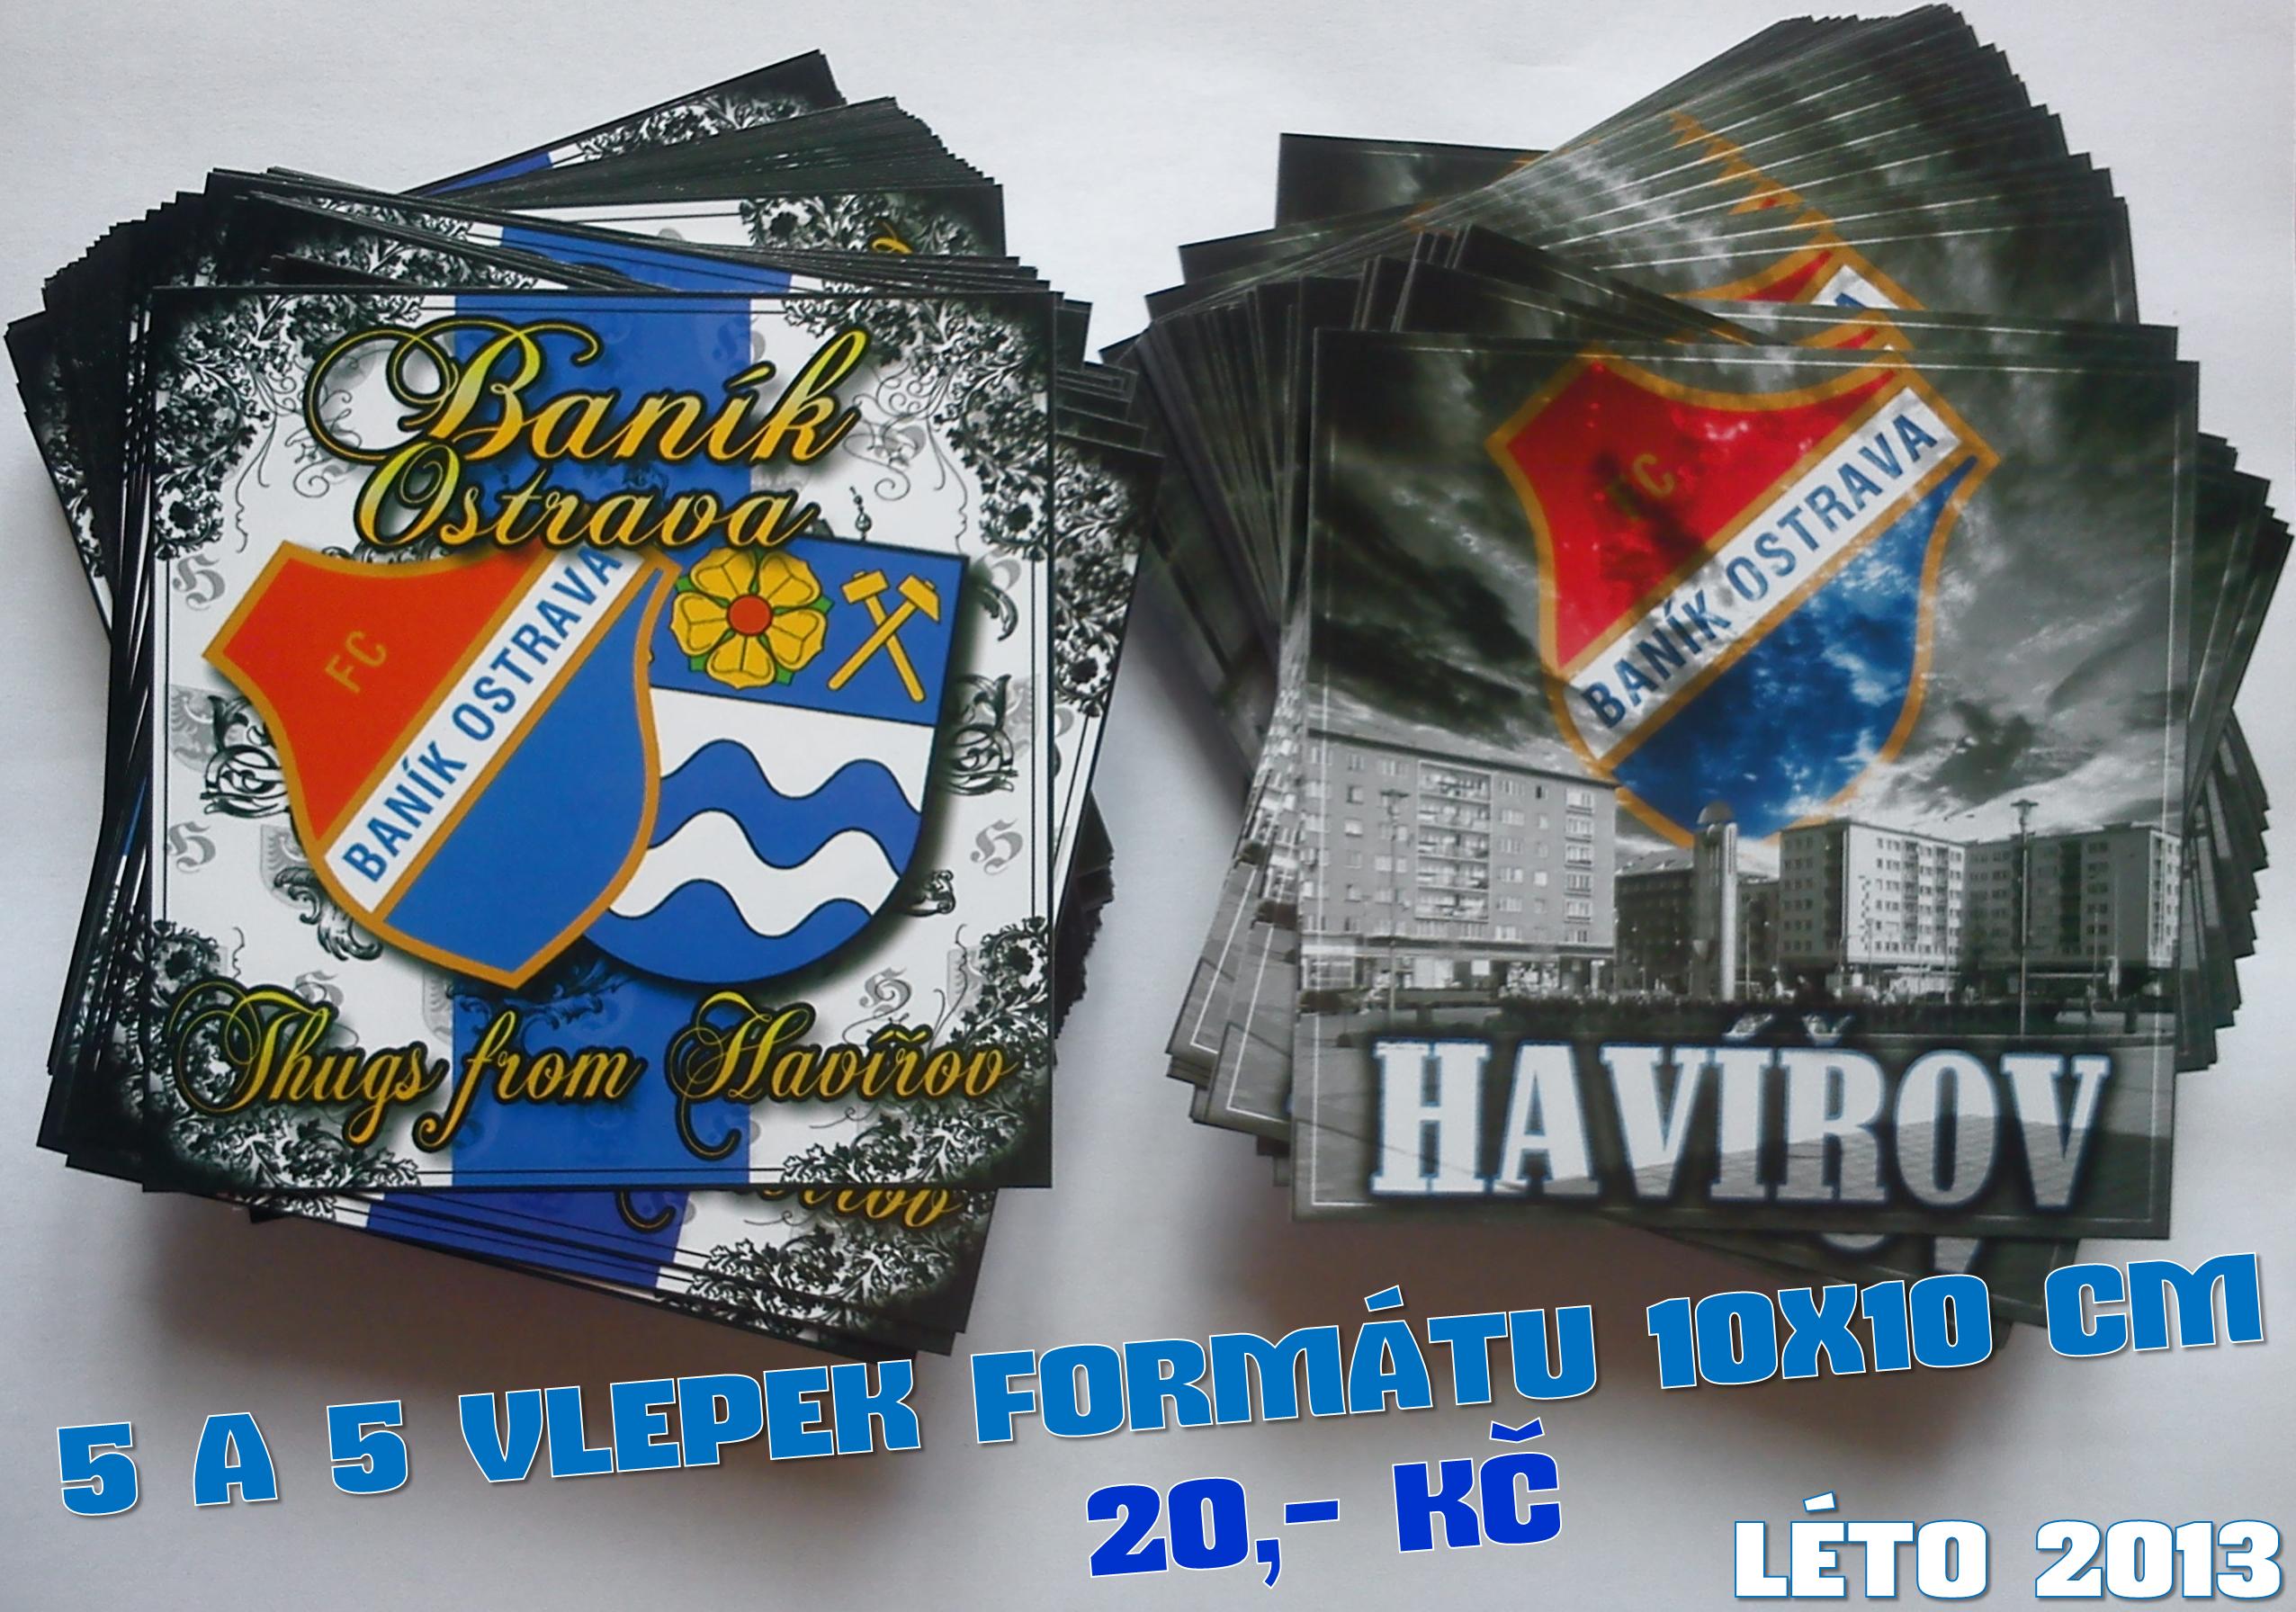 havirovaci.cz/wp-content-endora/uploads/2013/06/LETO2013.png